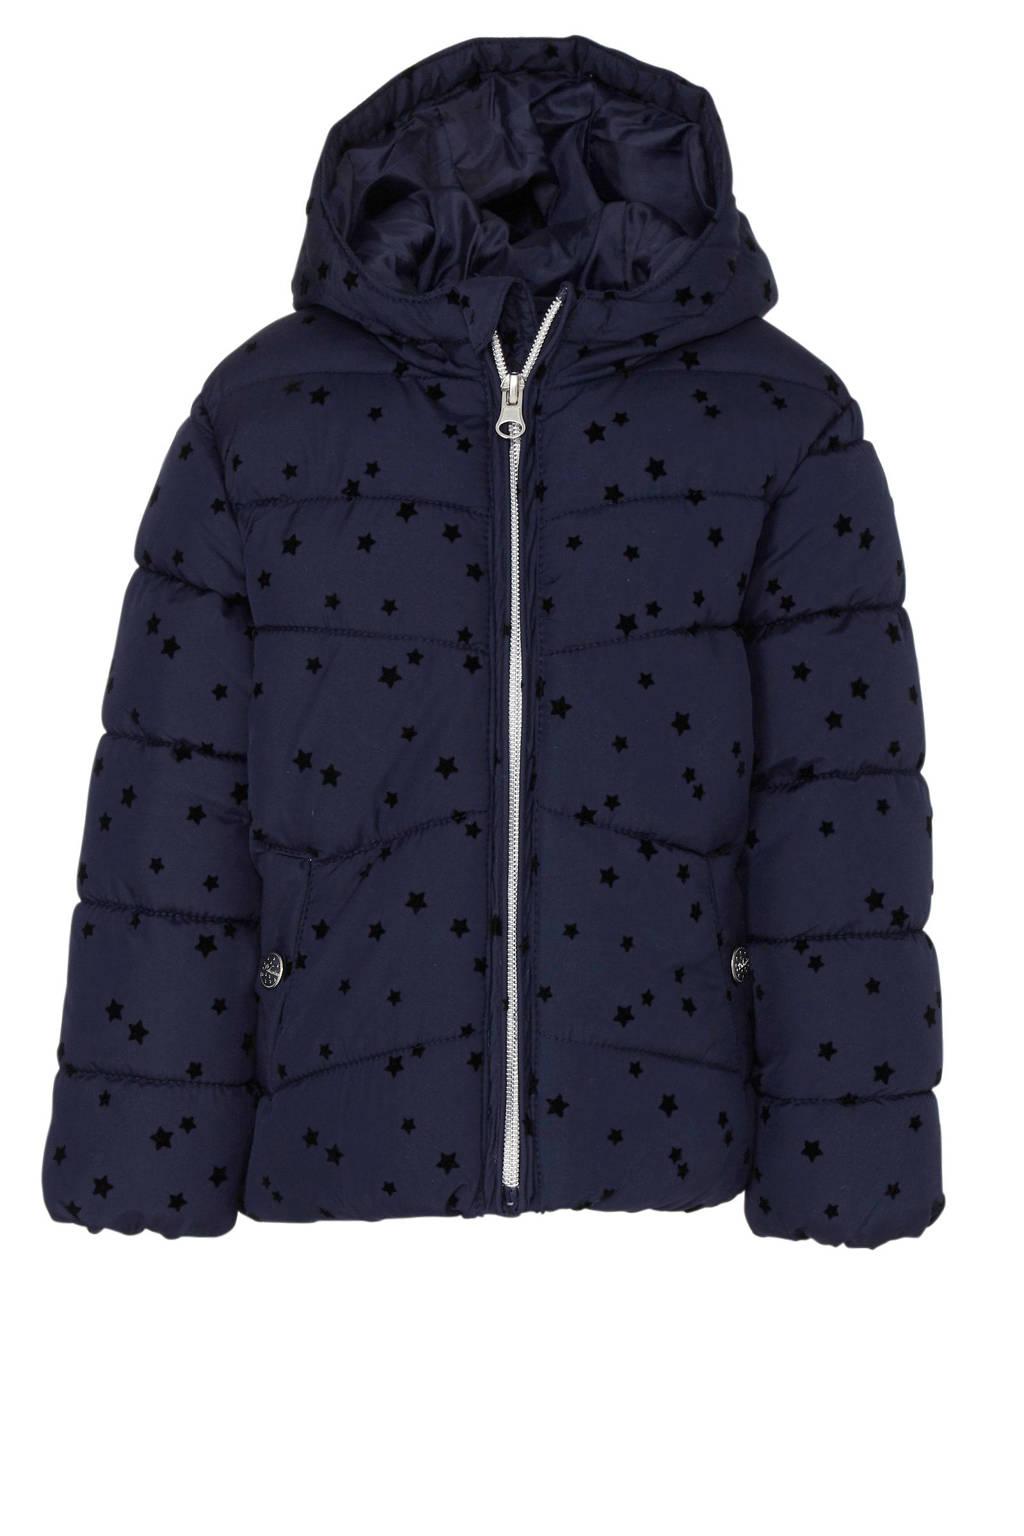 C&A Palomino winterjas met sterren donkerblauw, Donkerblauw